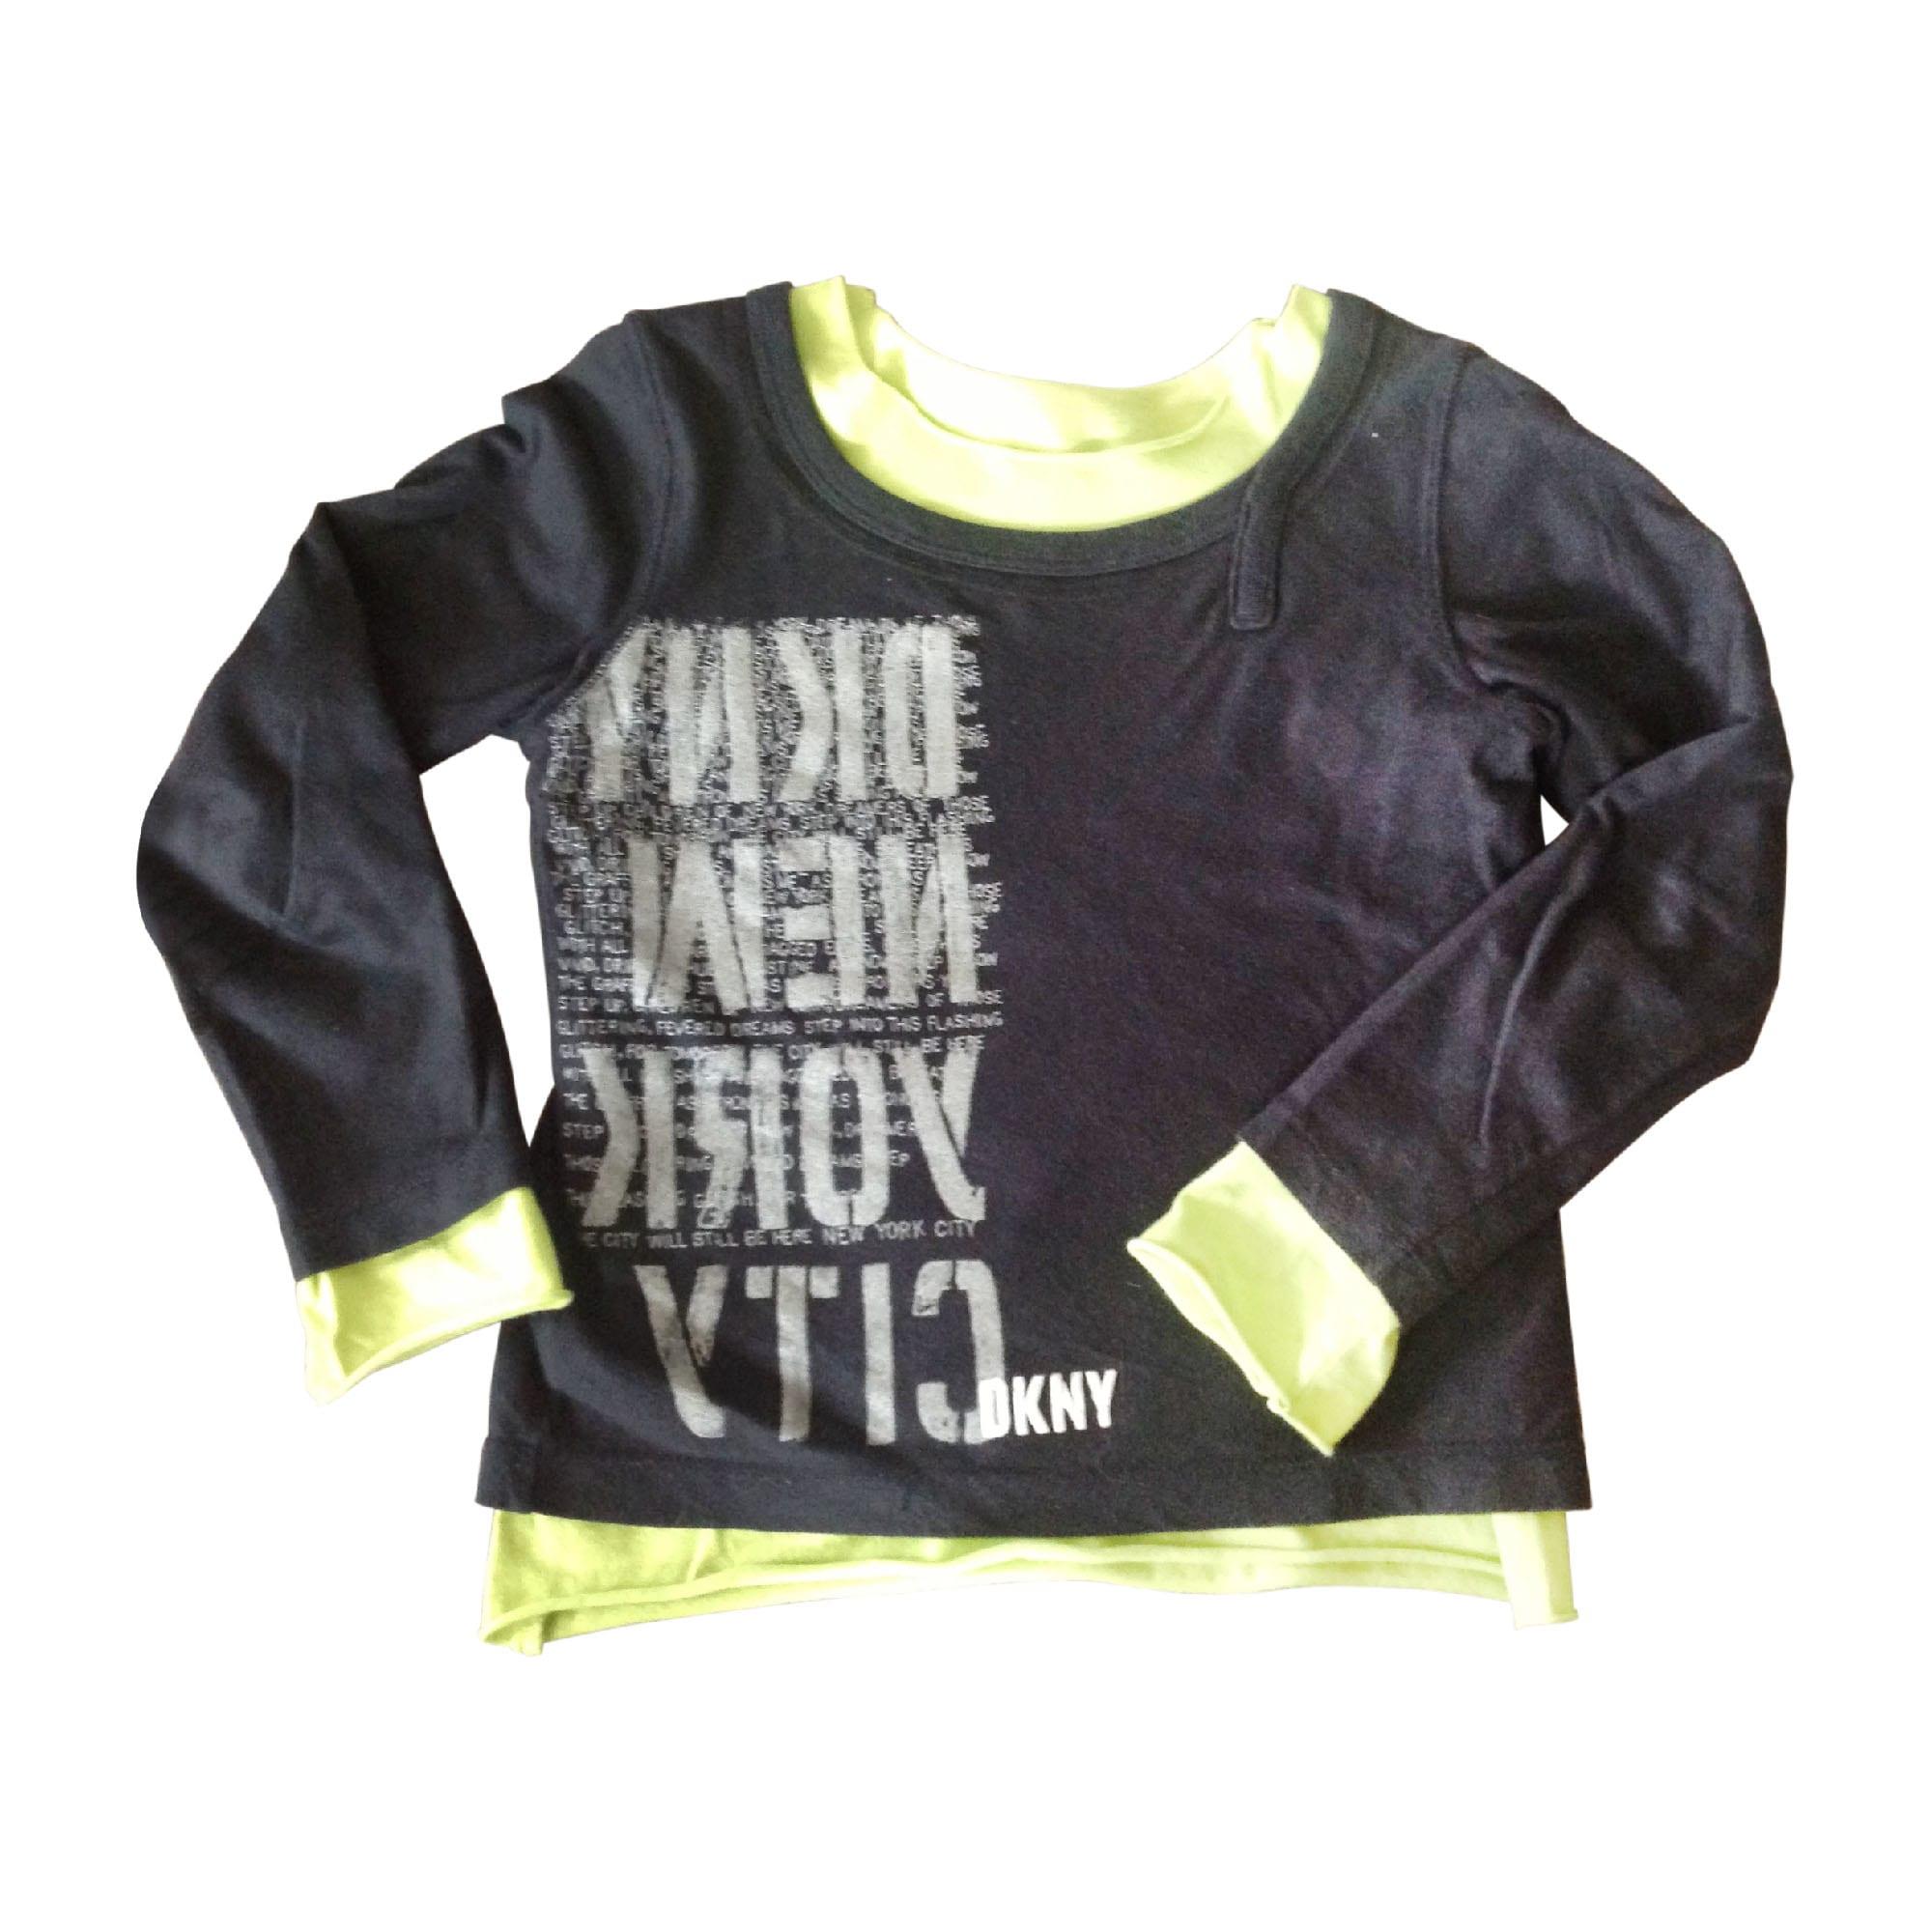 Top, Tee-shirt DKNY Noir